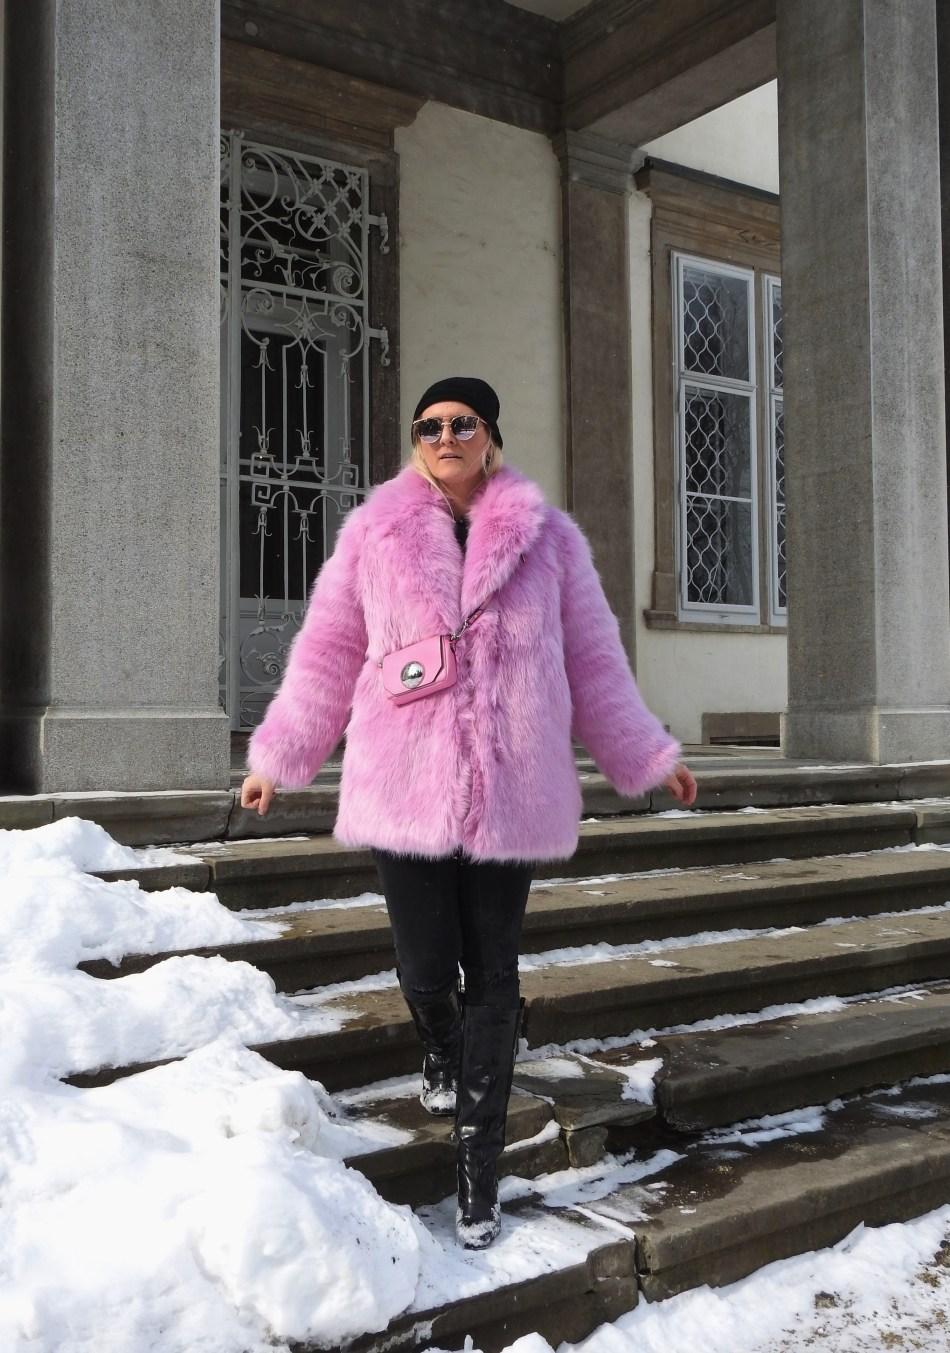 Pink-Fake-Fur-Coat-Faux-Fur-H&M-Patent-Leather-Boots-Black-Denim-Black-Metallic-Sunglasses-carrieslifestyle-Tamara-Prutsch